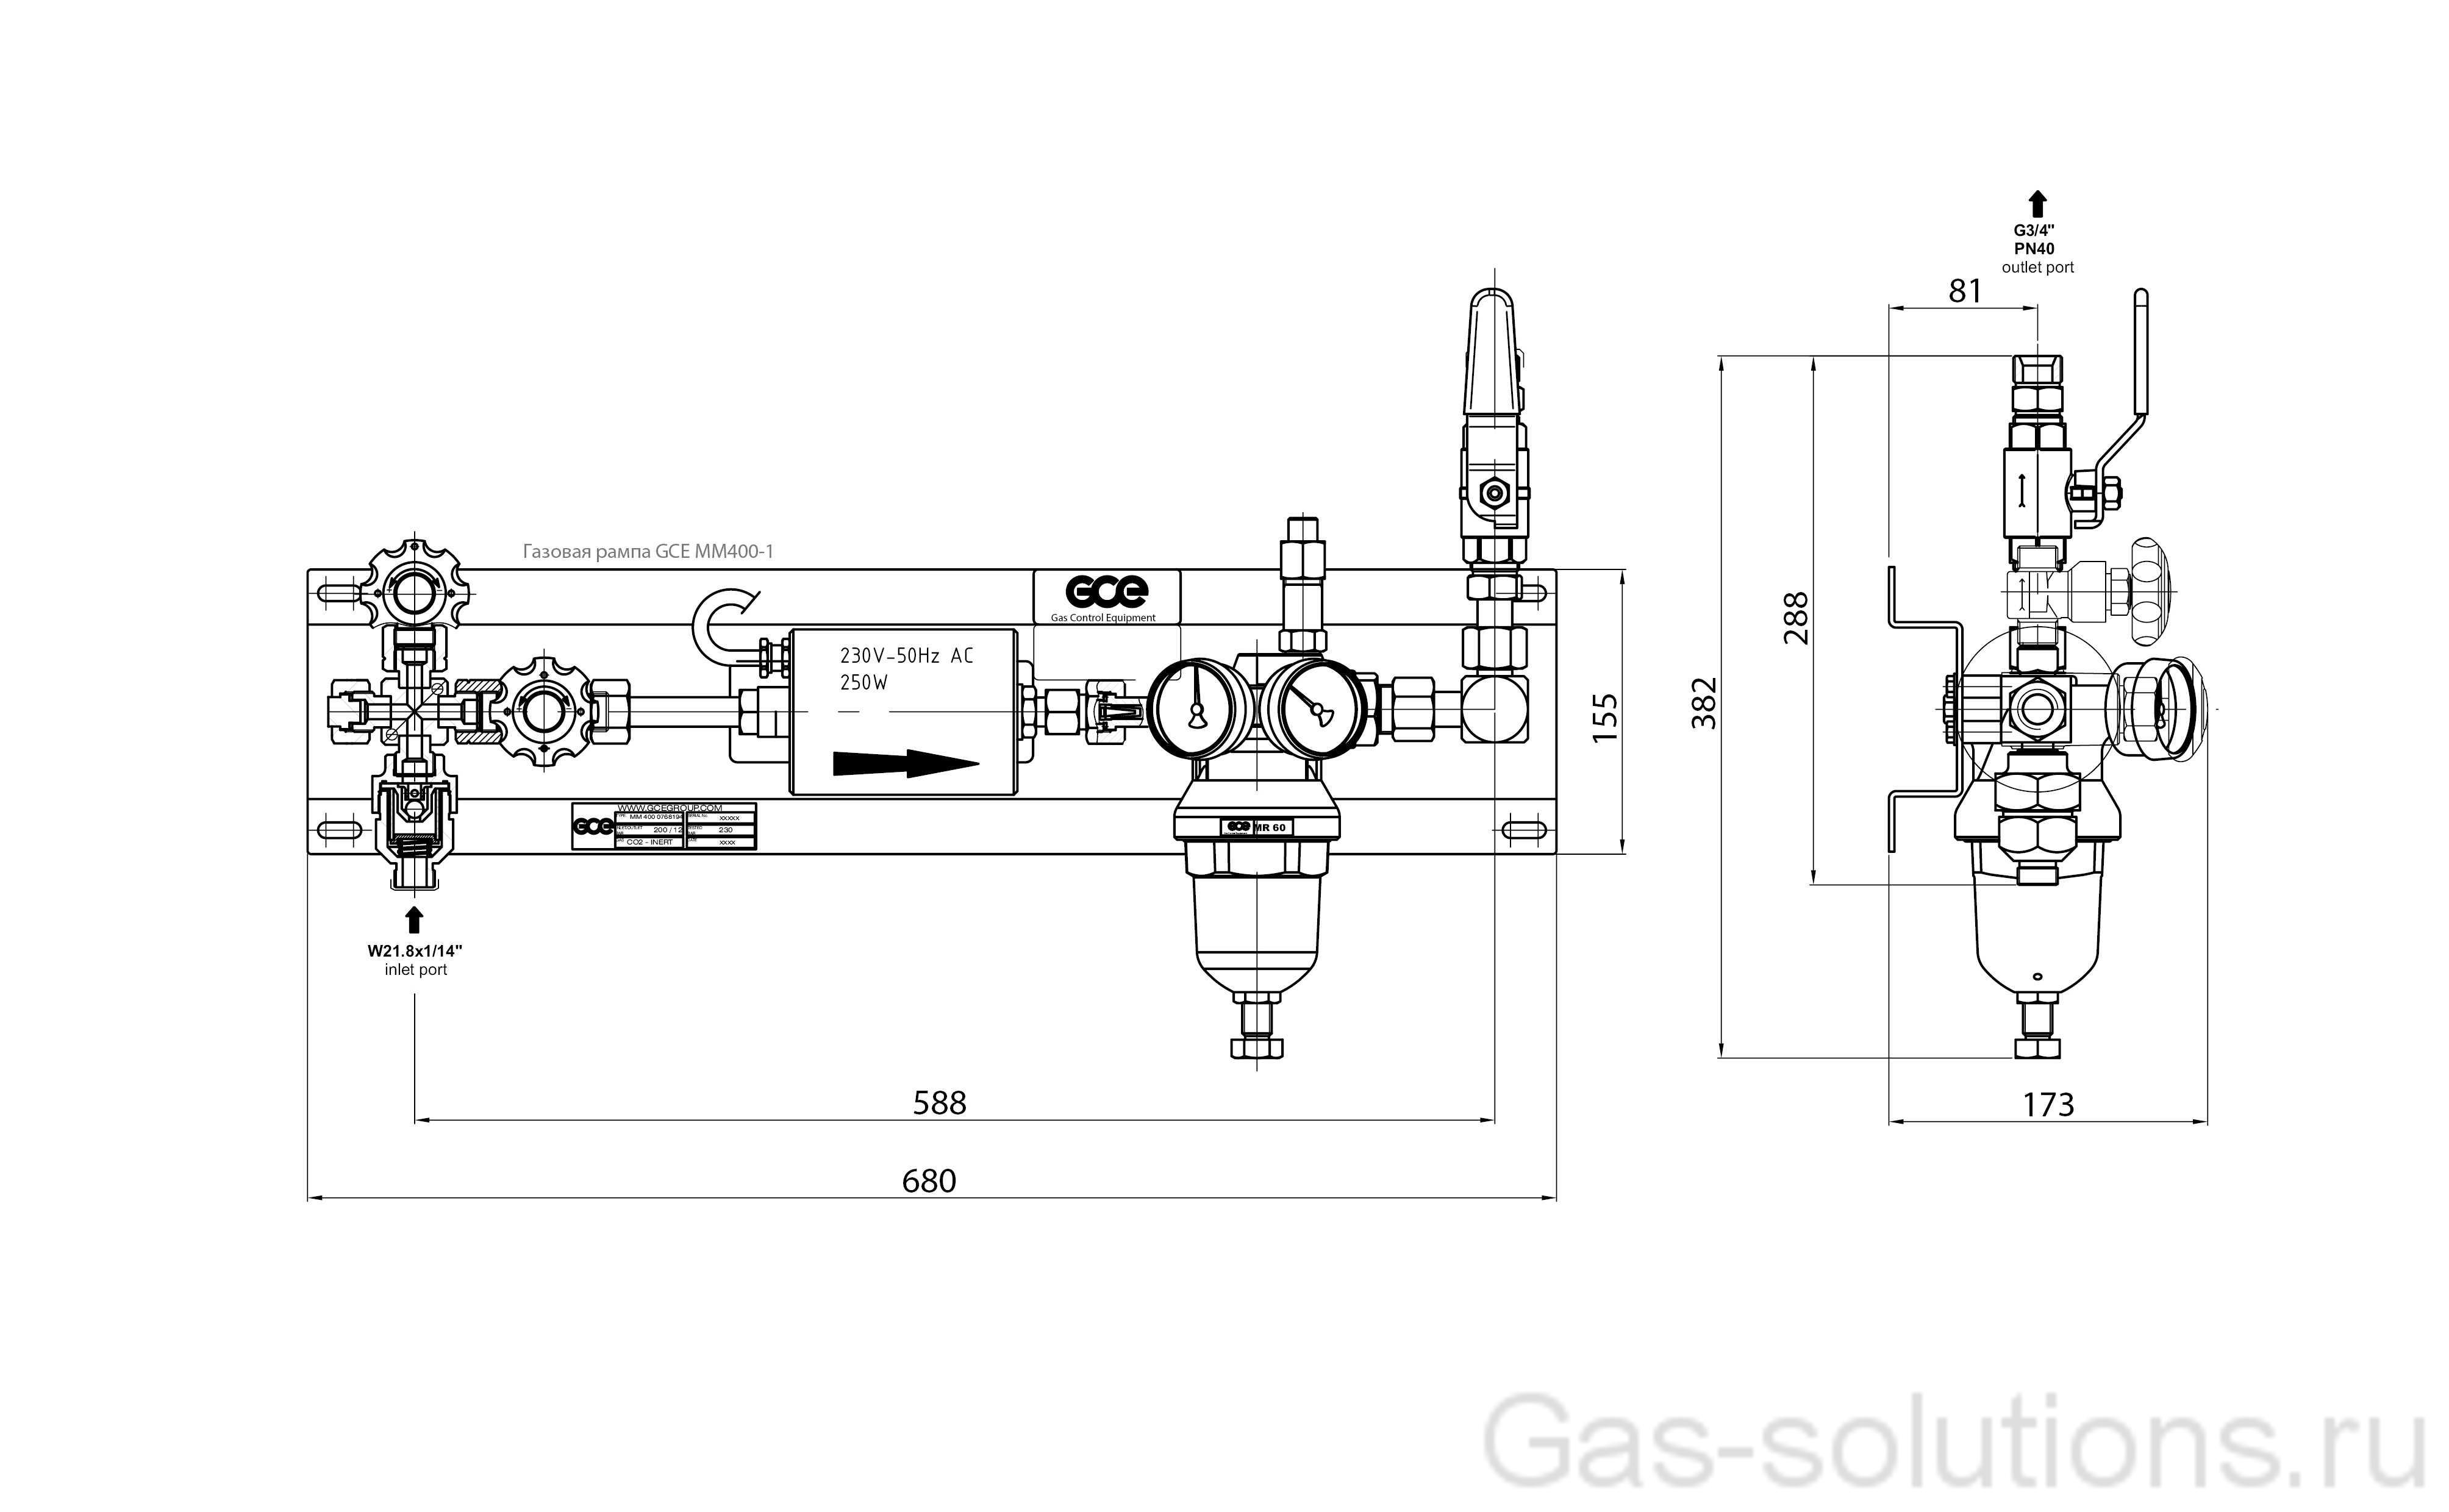 Газовая рампа GCE MM400-1 с подогревателем _чертеж